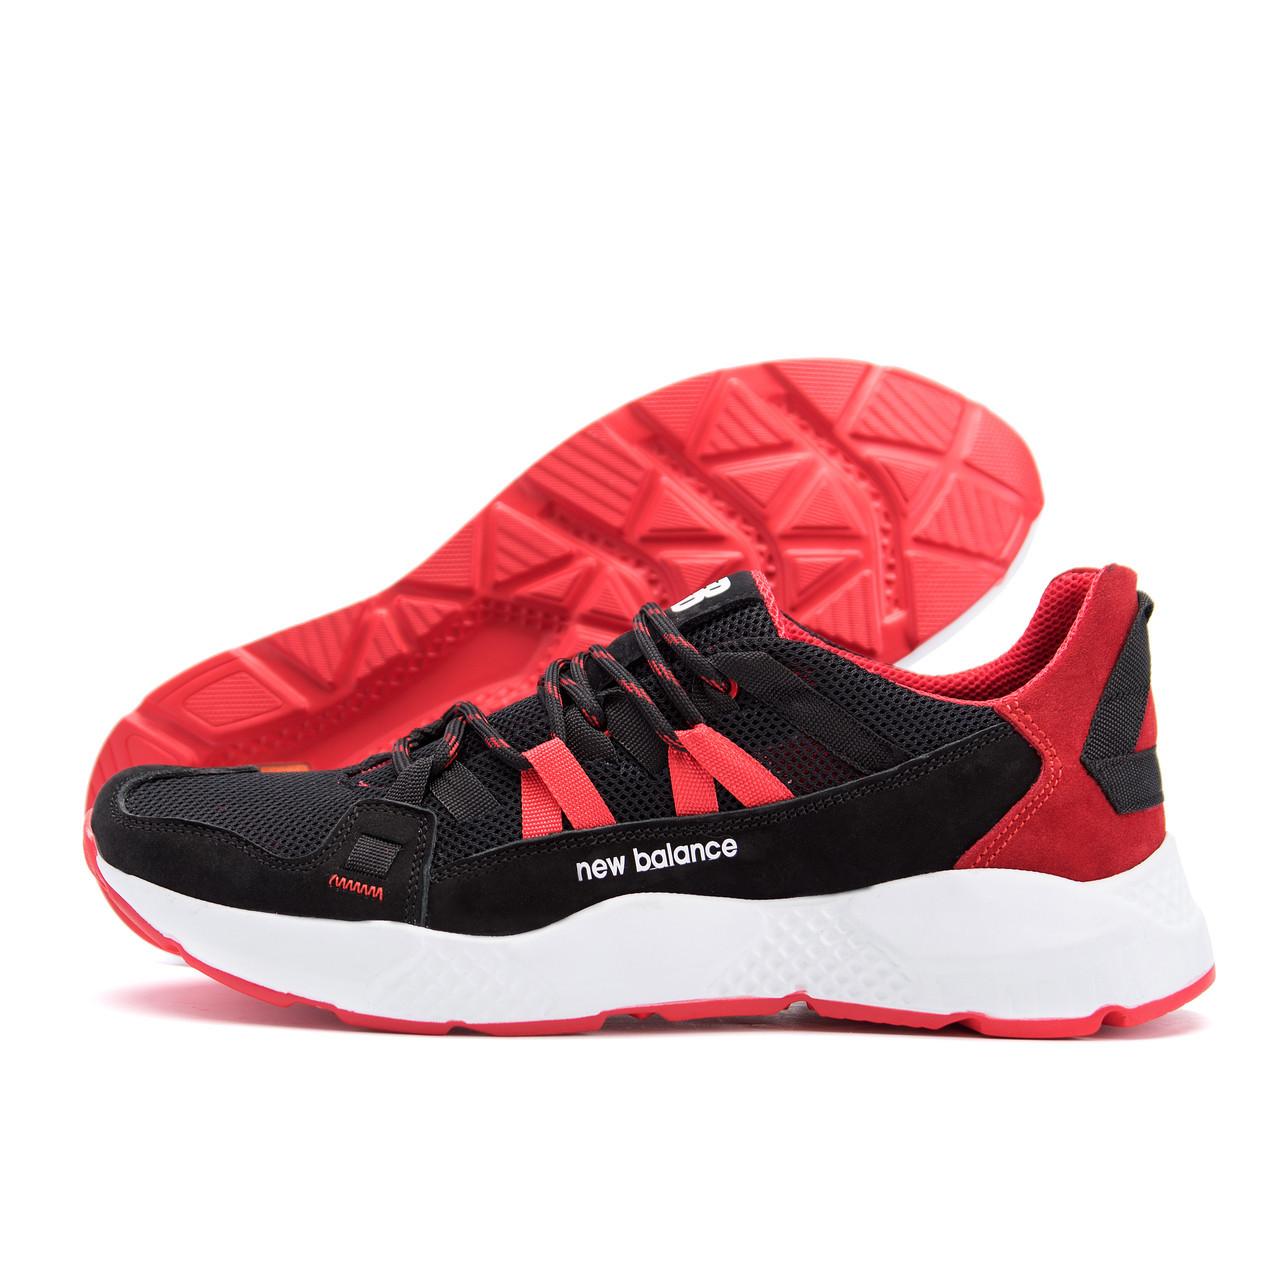 Мужские летние кроссовки сетка New Balance Black Red